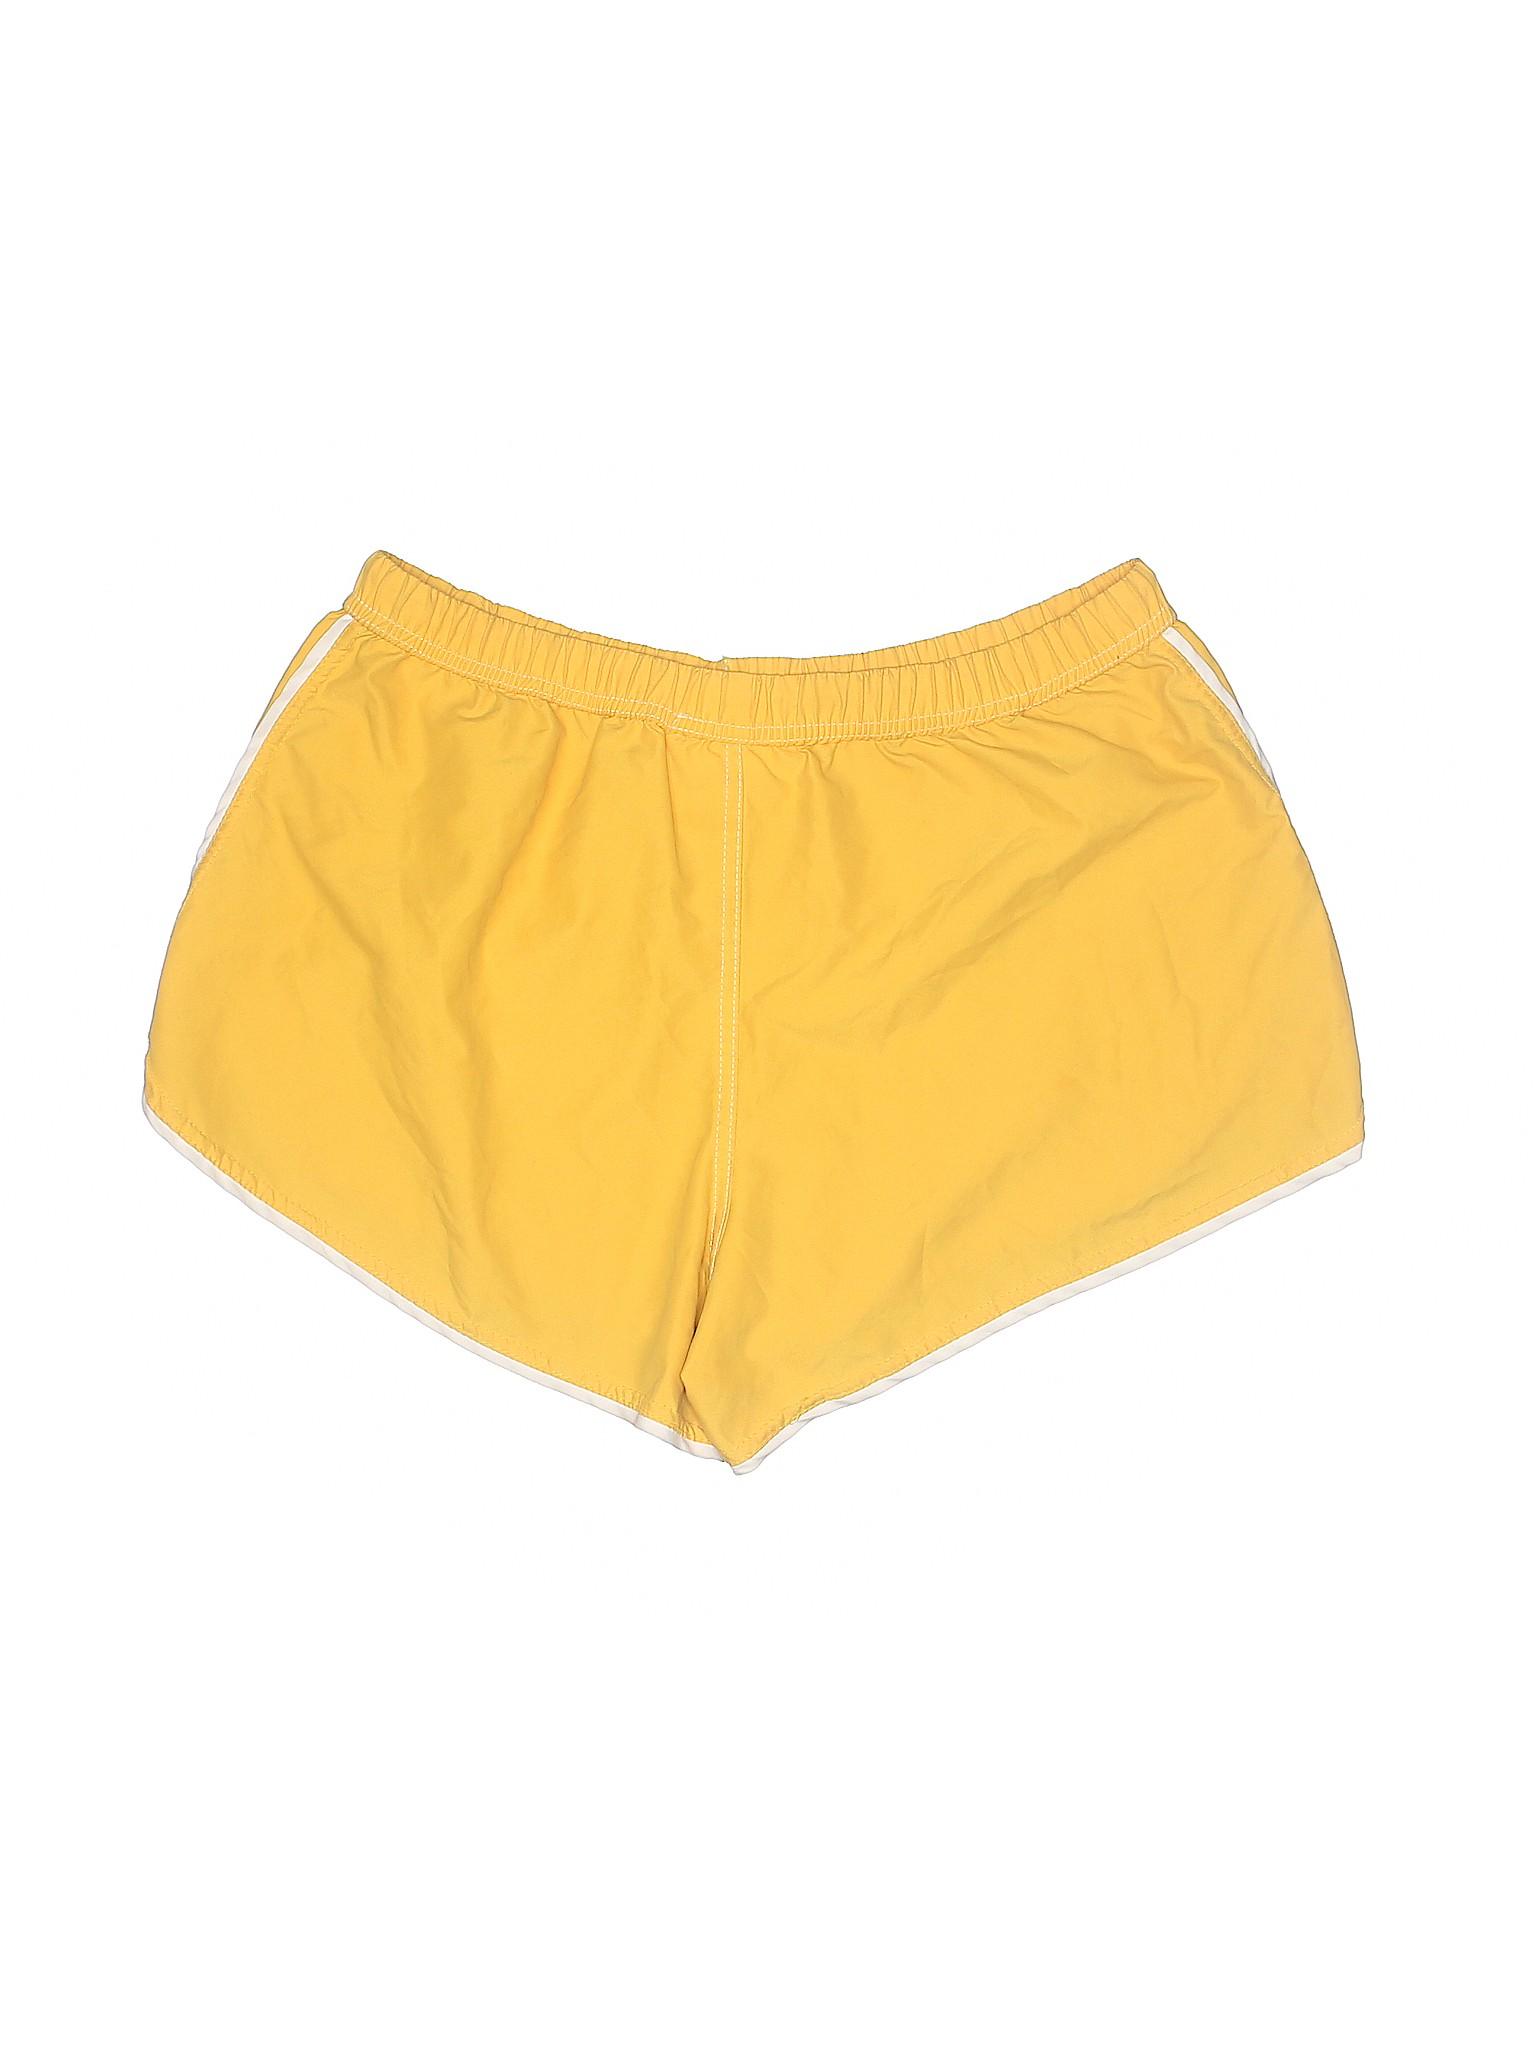 Shorts Boutique Boutique Vital Athletic Vital gI0IXqUw